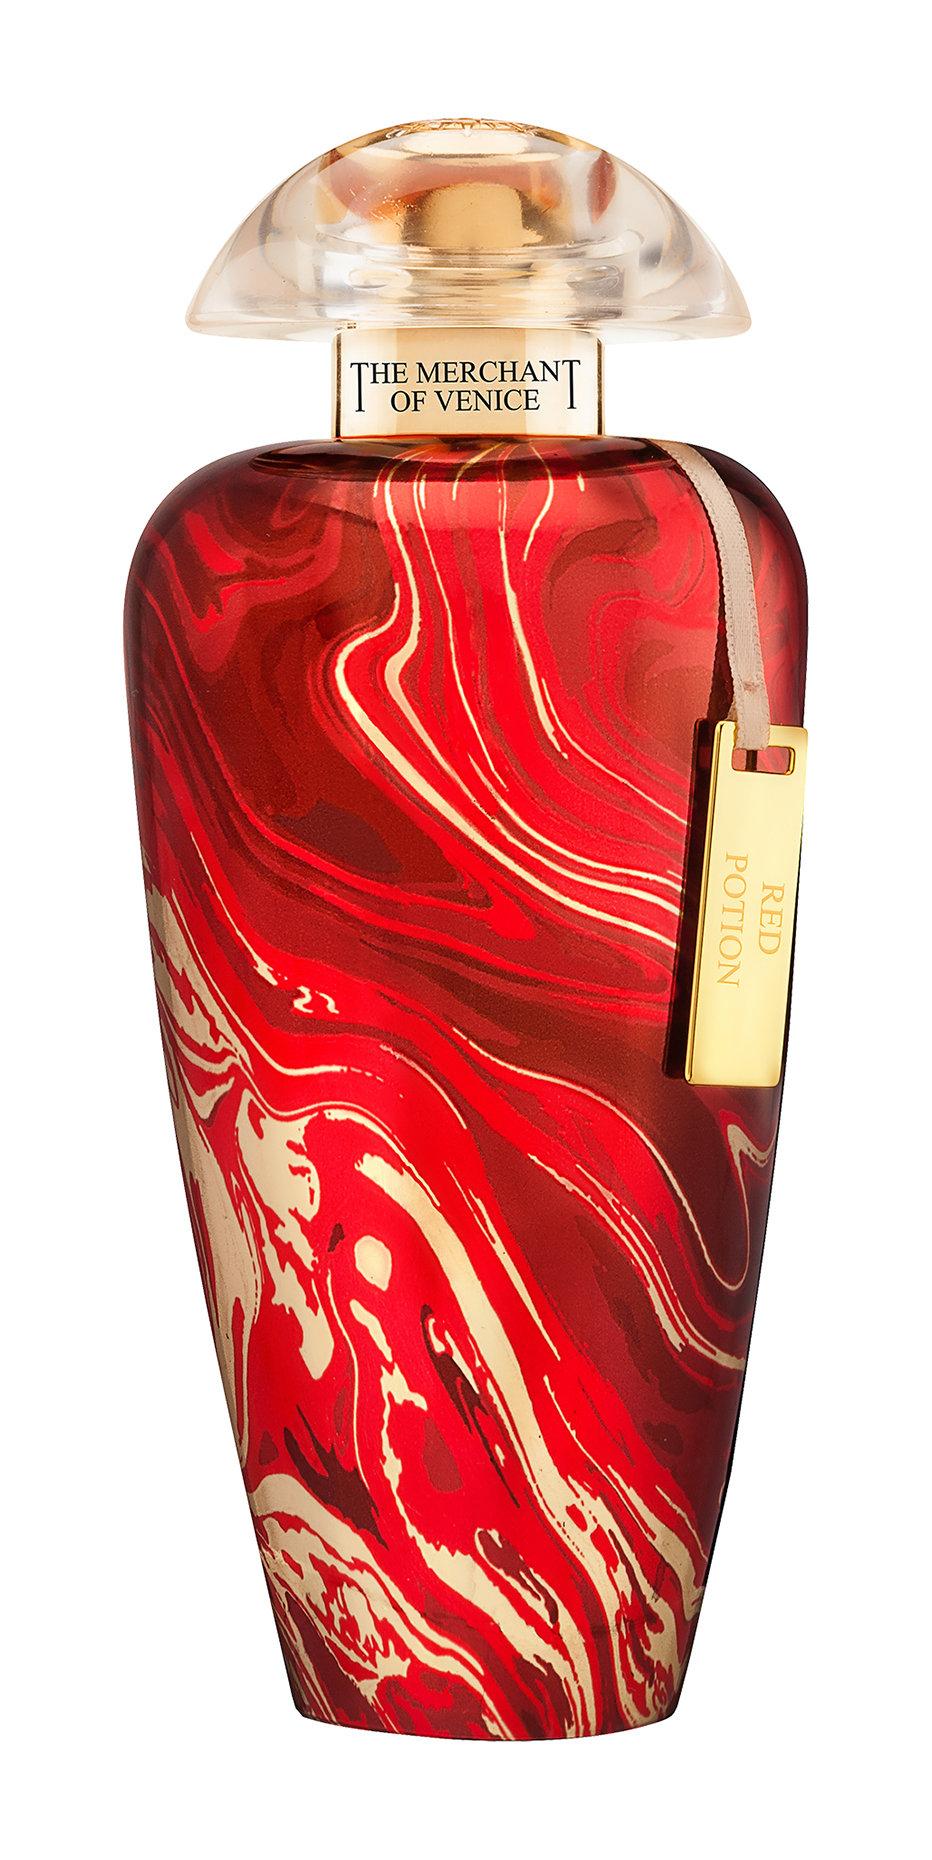 Купить Парфюмерная вода The Merchant of Venice Red Potion 100 мл